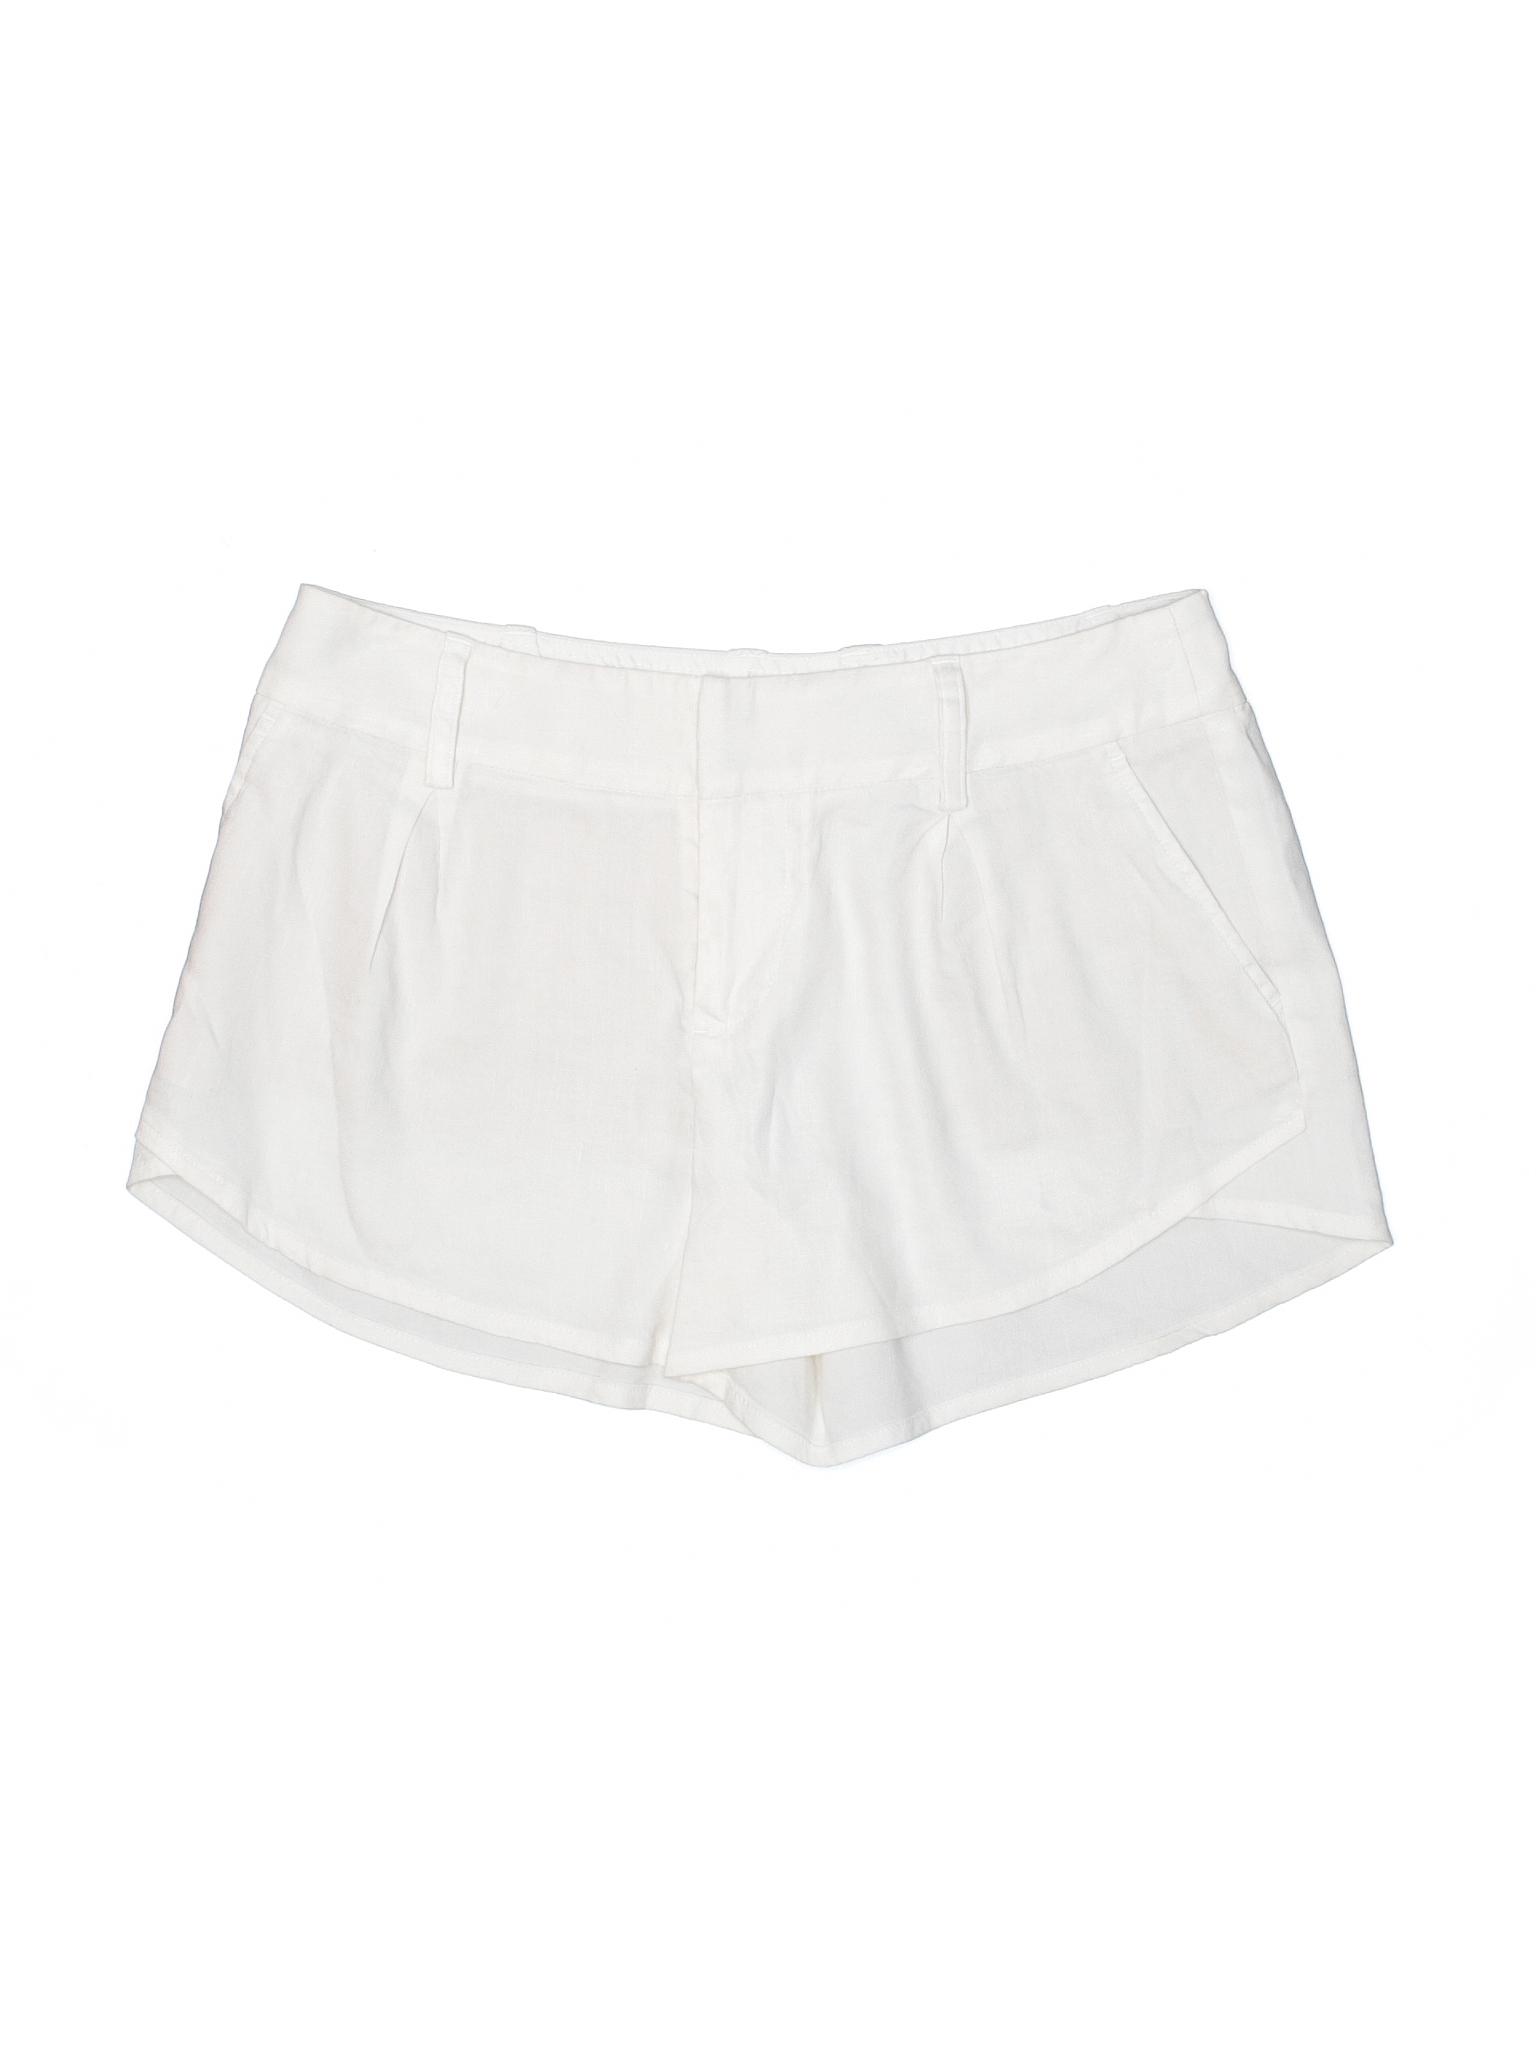 Shorts alice olivia Boutique olivia alice Boutique Shorts olivia Shorts Boutique alice Boutique pqwpFUY6